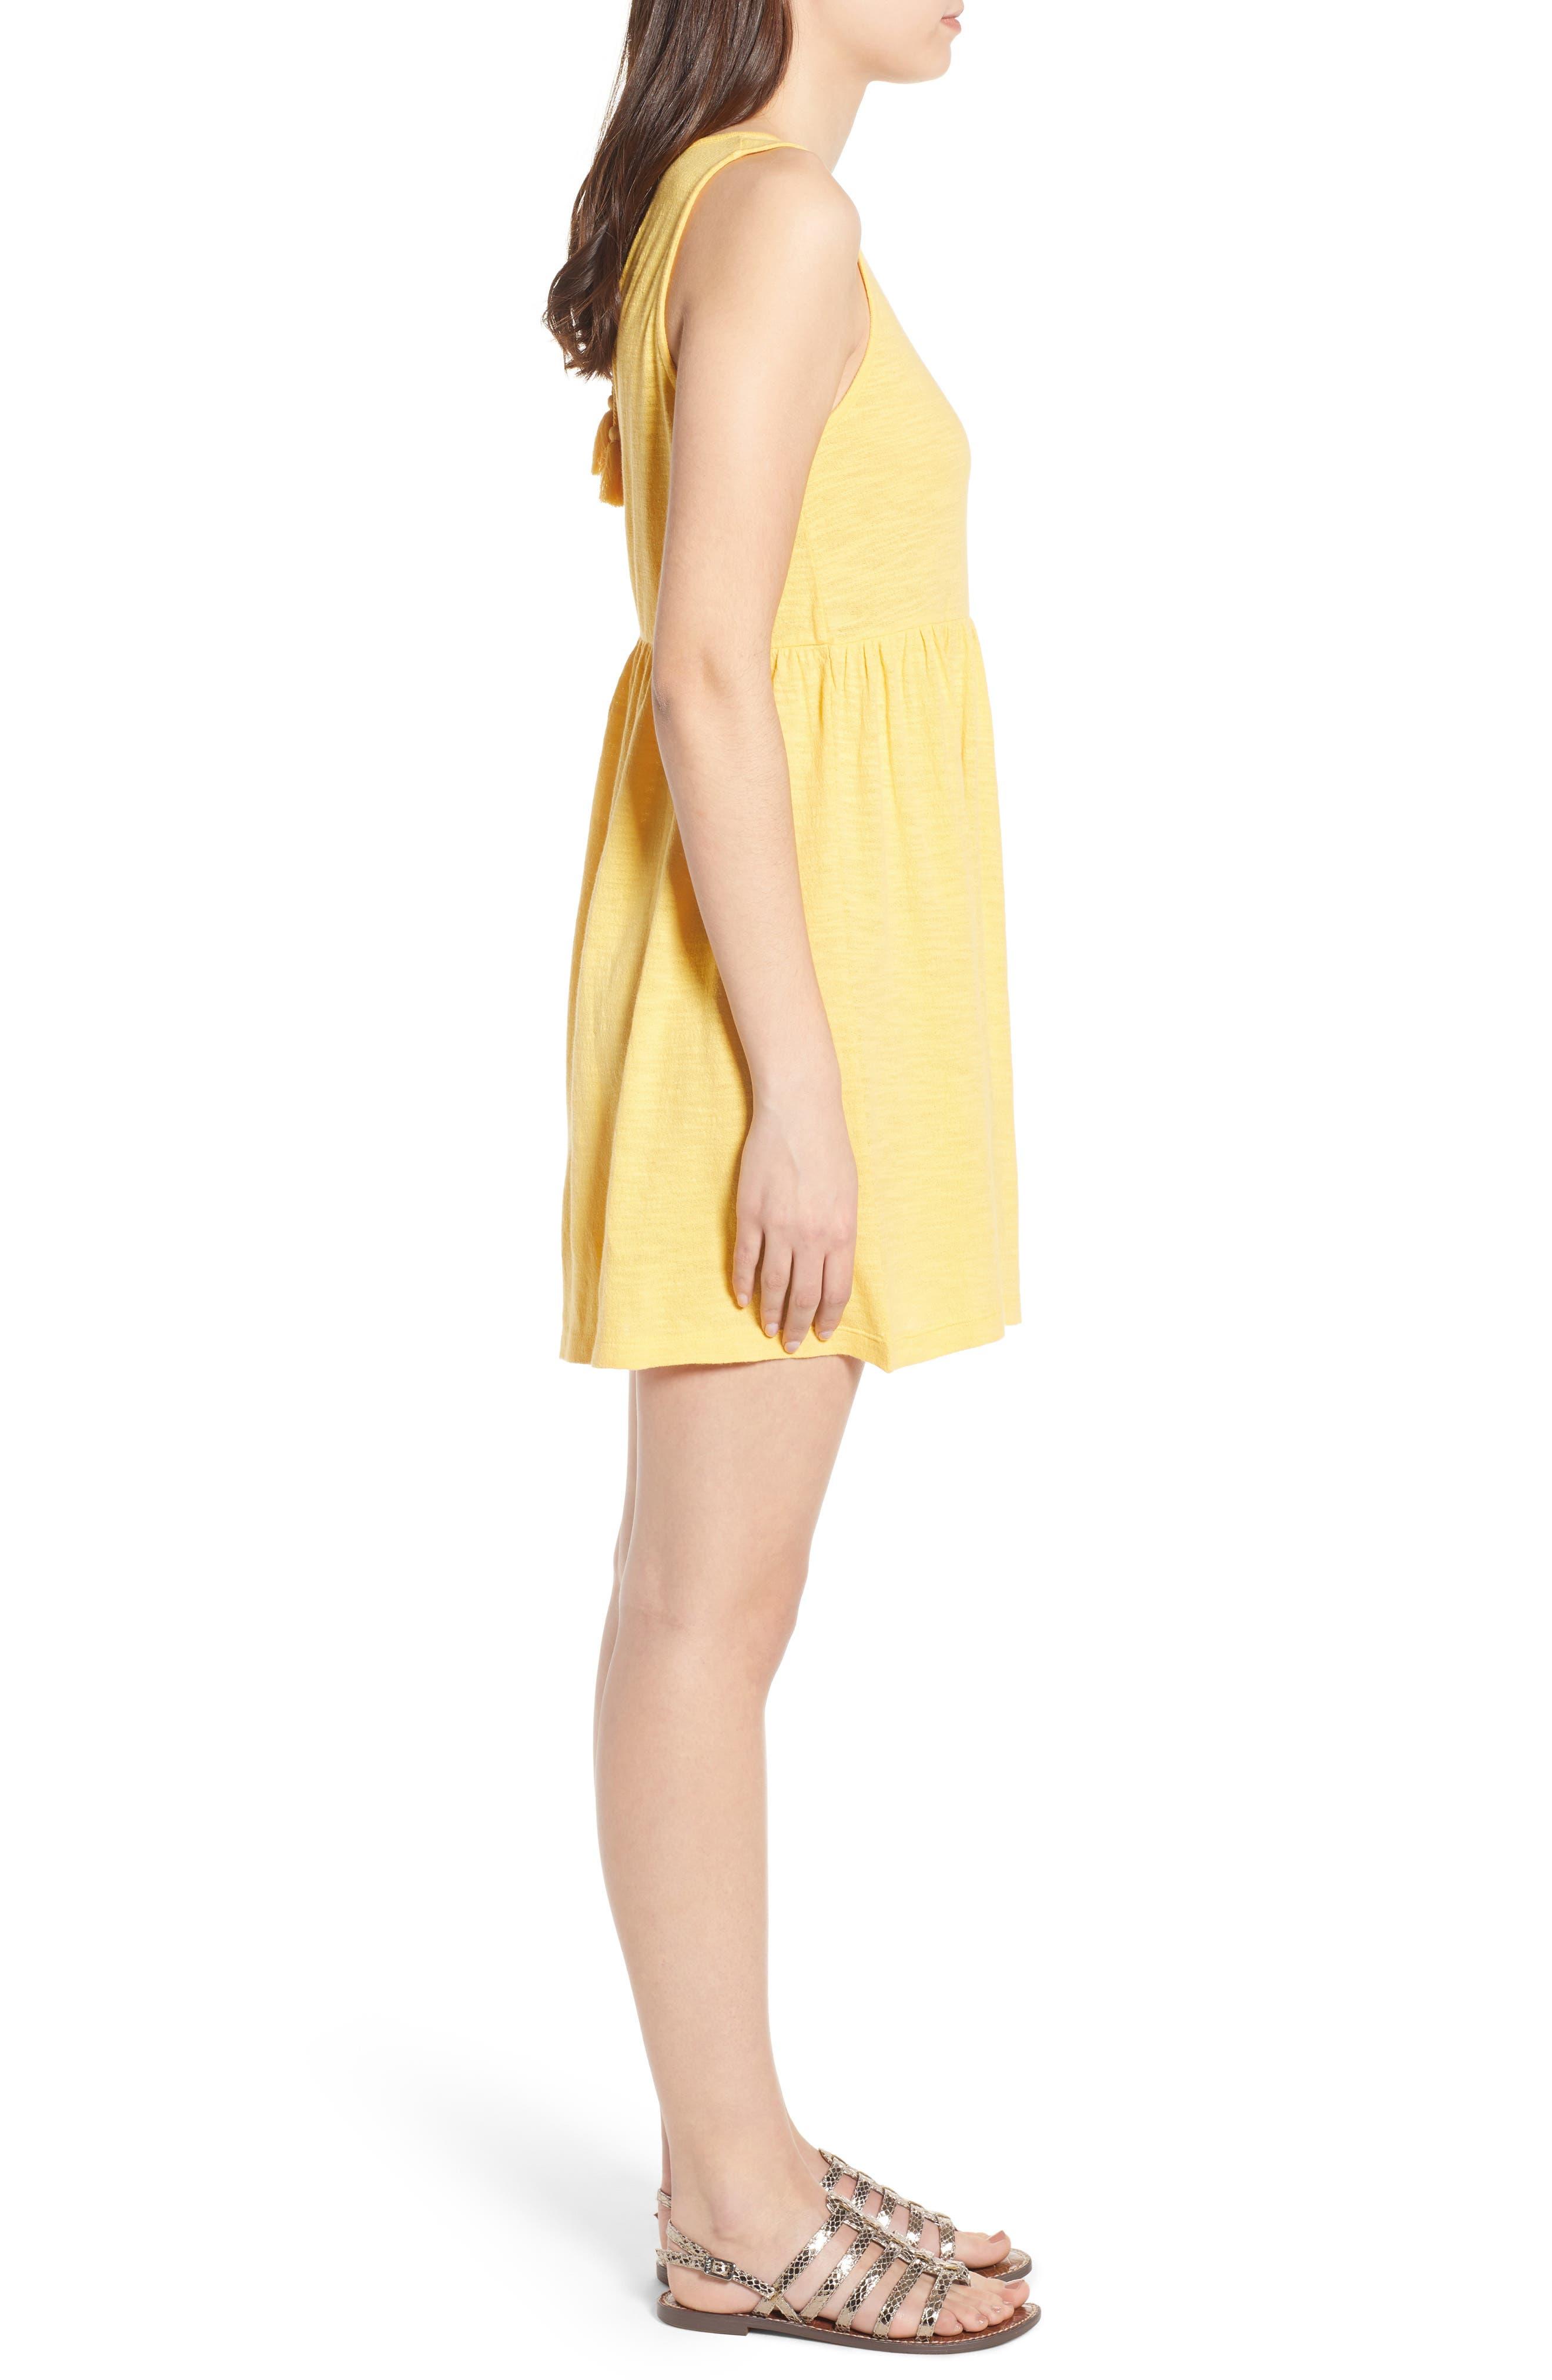 Tucson Cotton Dress,                             Alternate thumbnail 3, color,                             Buff Yellow